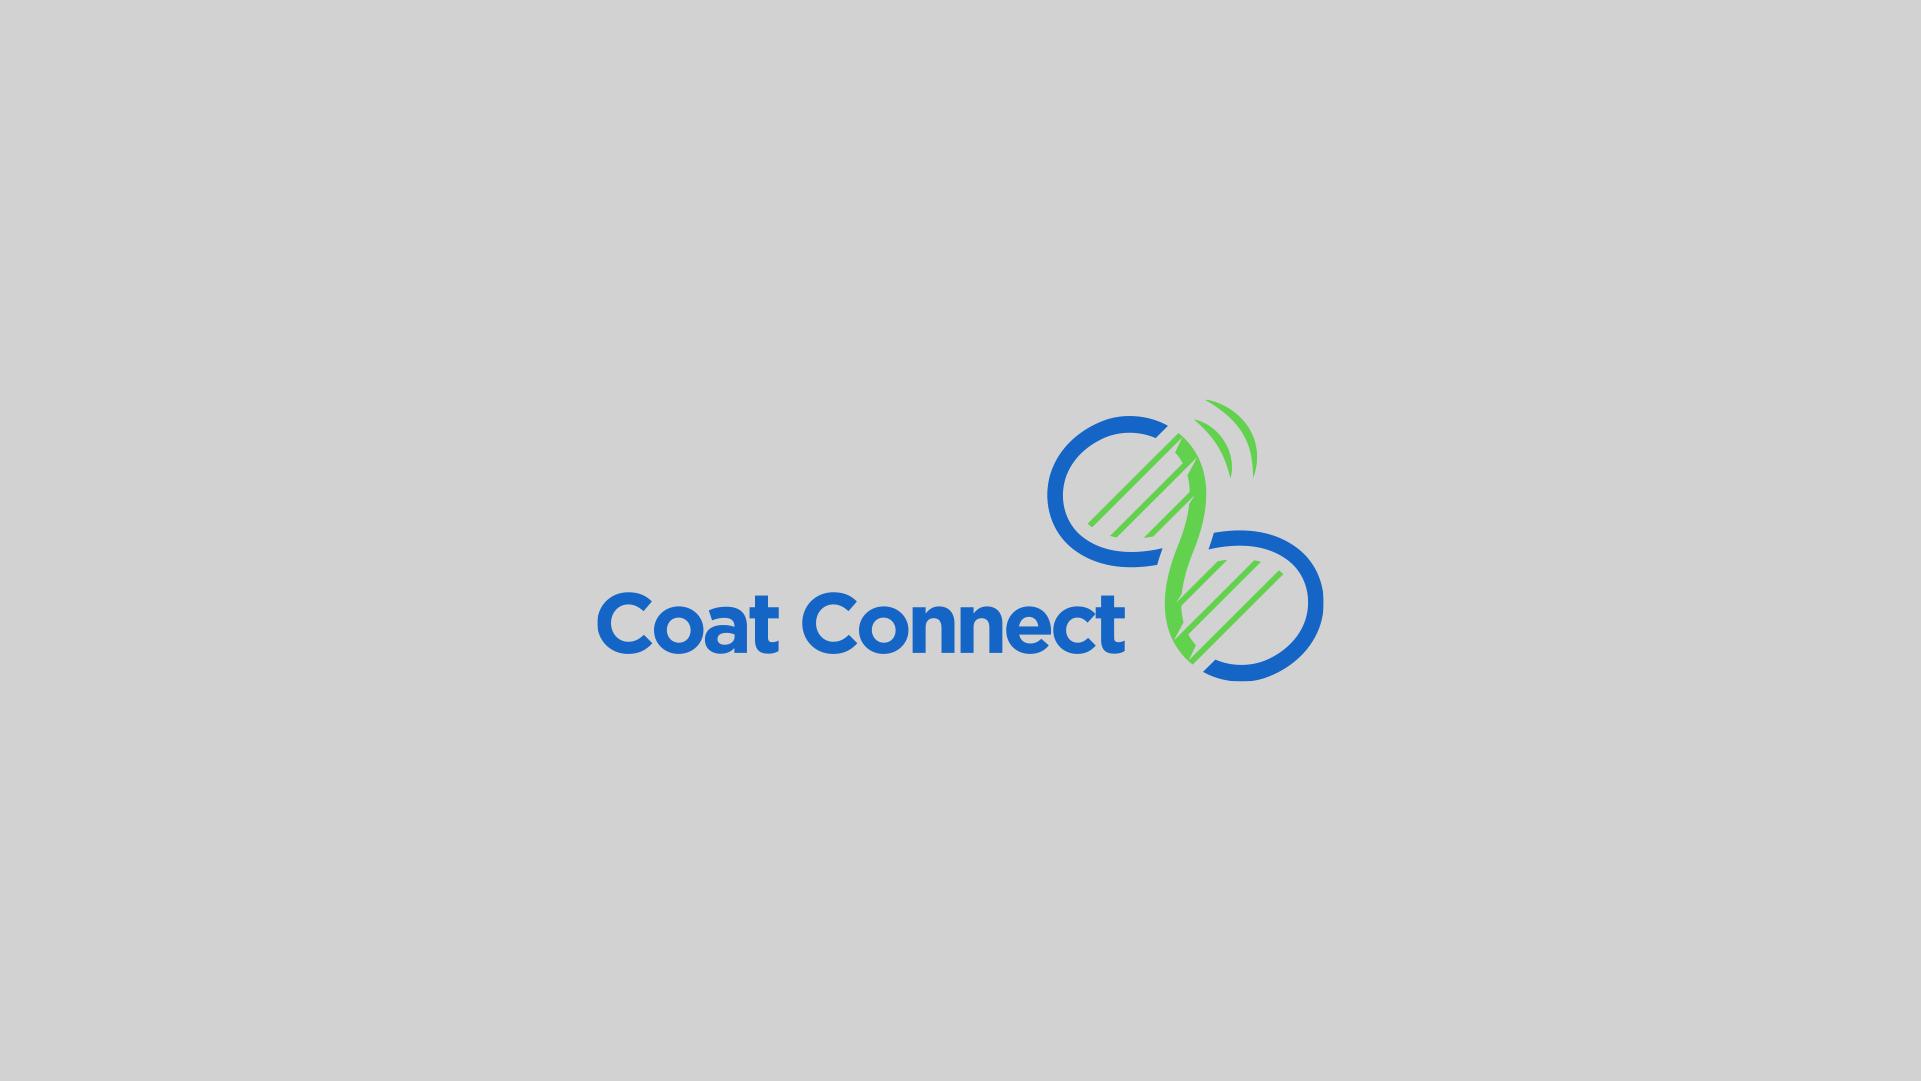 Coat Connect